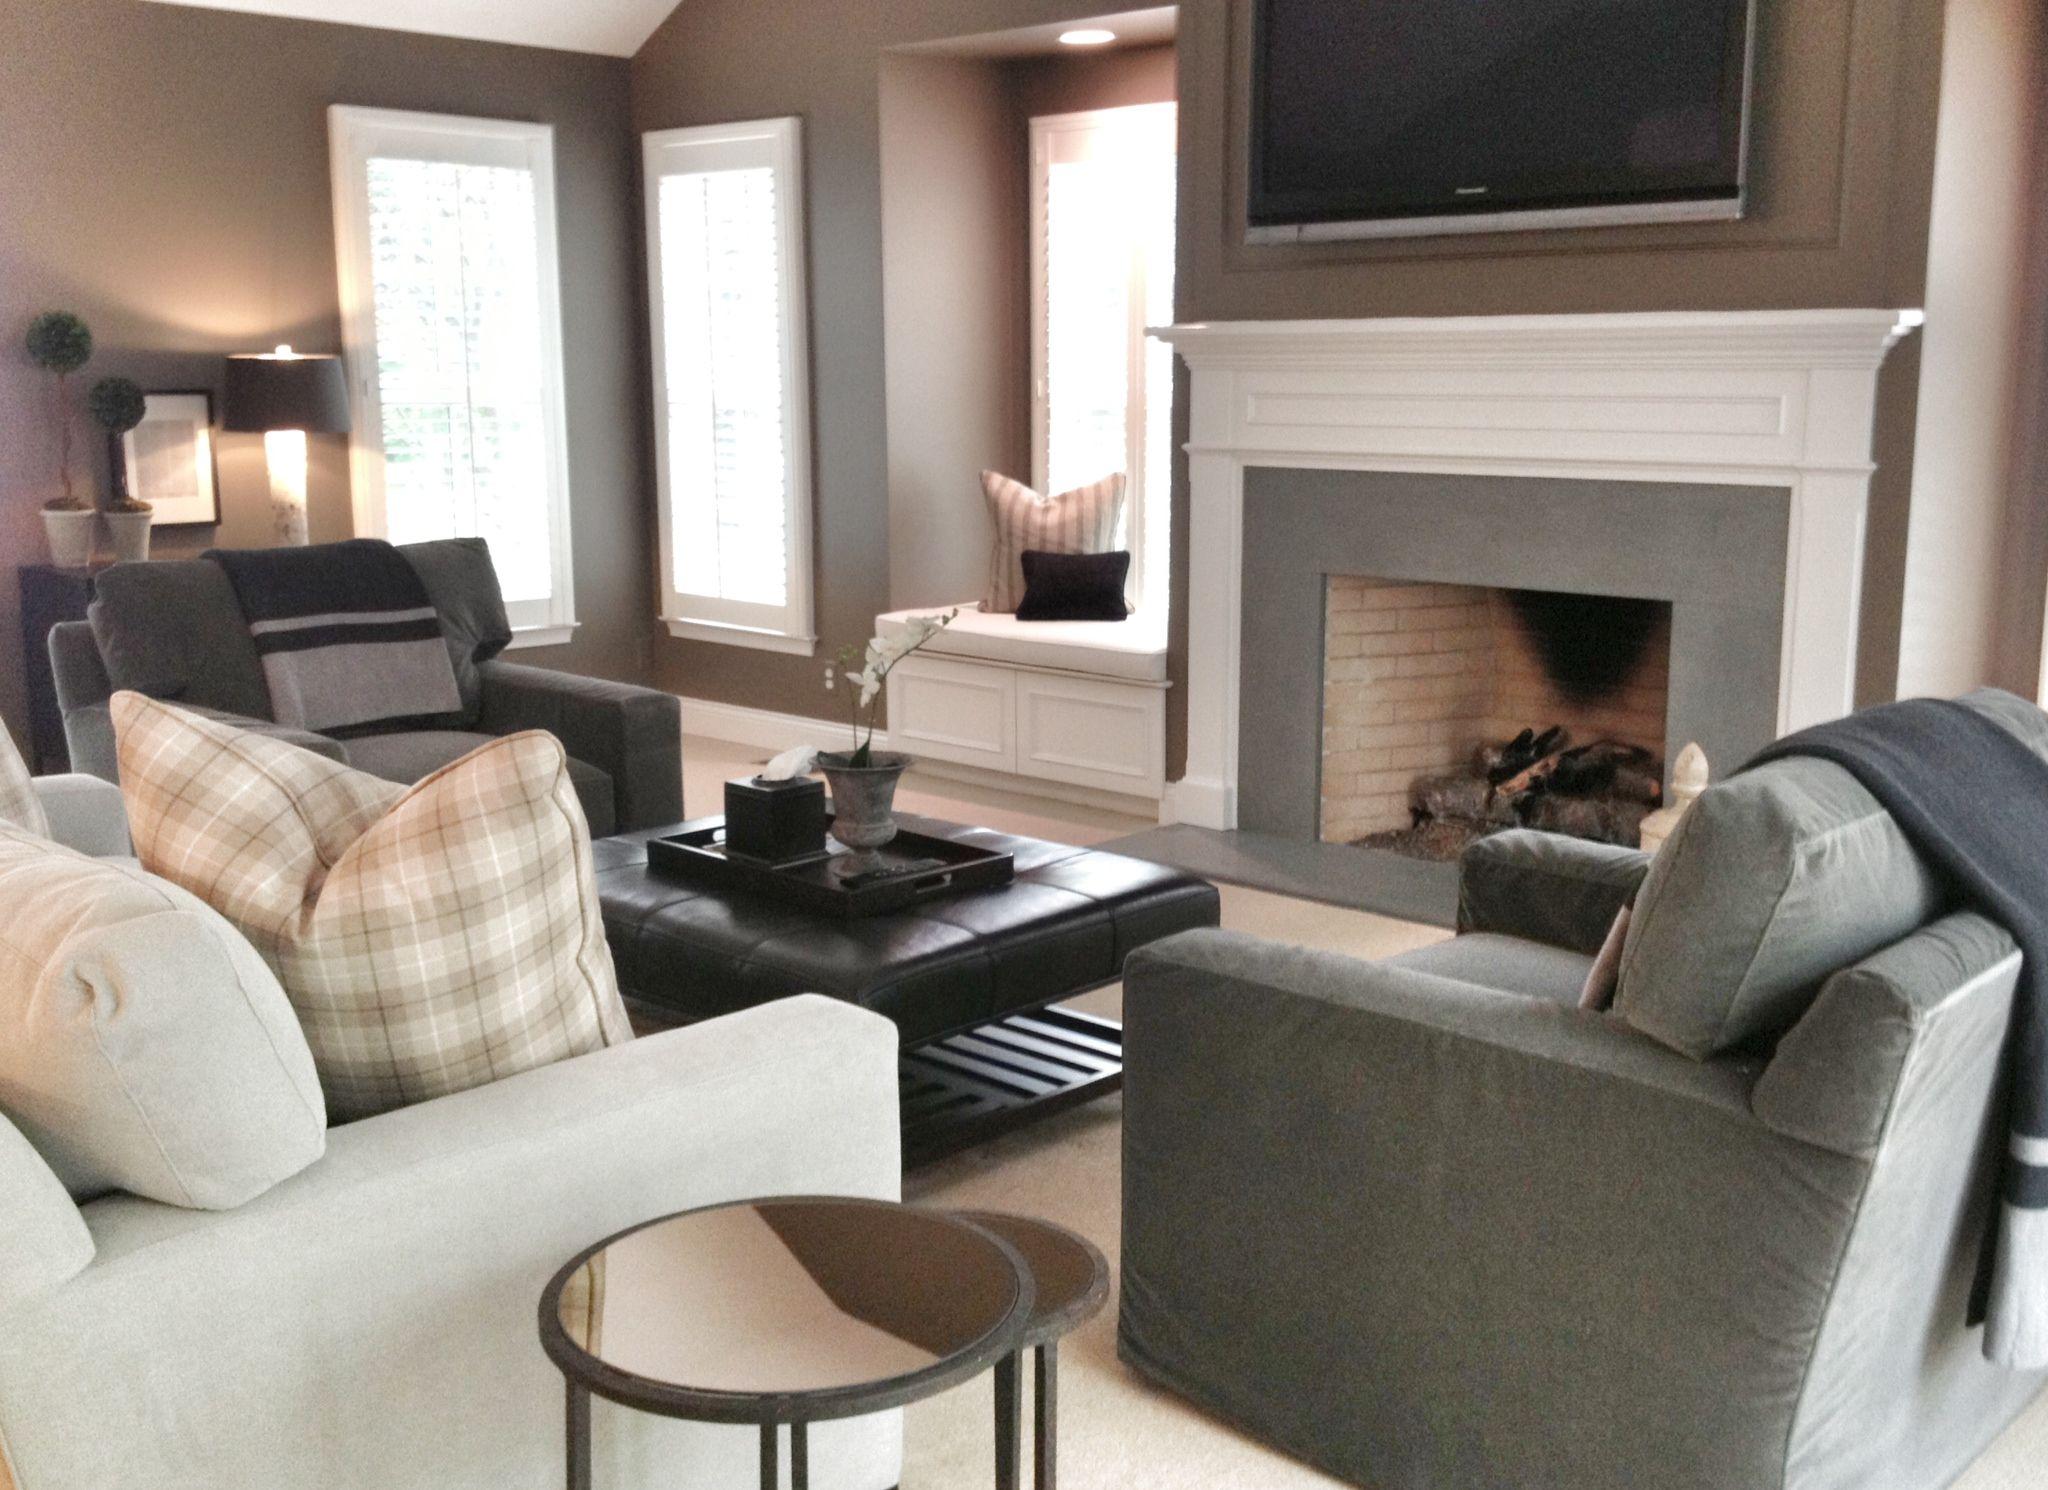 Design Daredevil Bachelor Pad Livingroom 3 - Bachelor Pad -